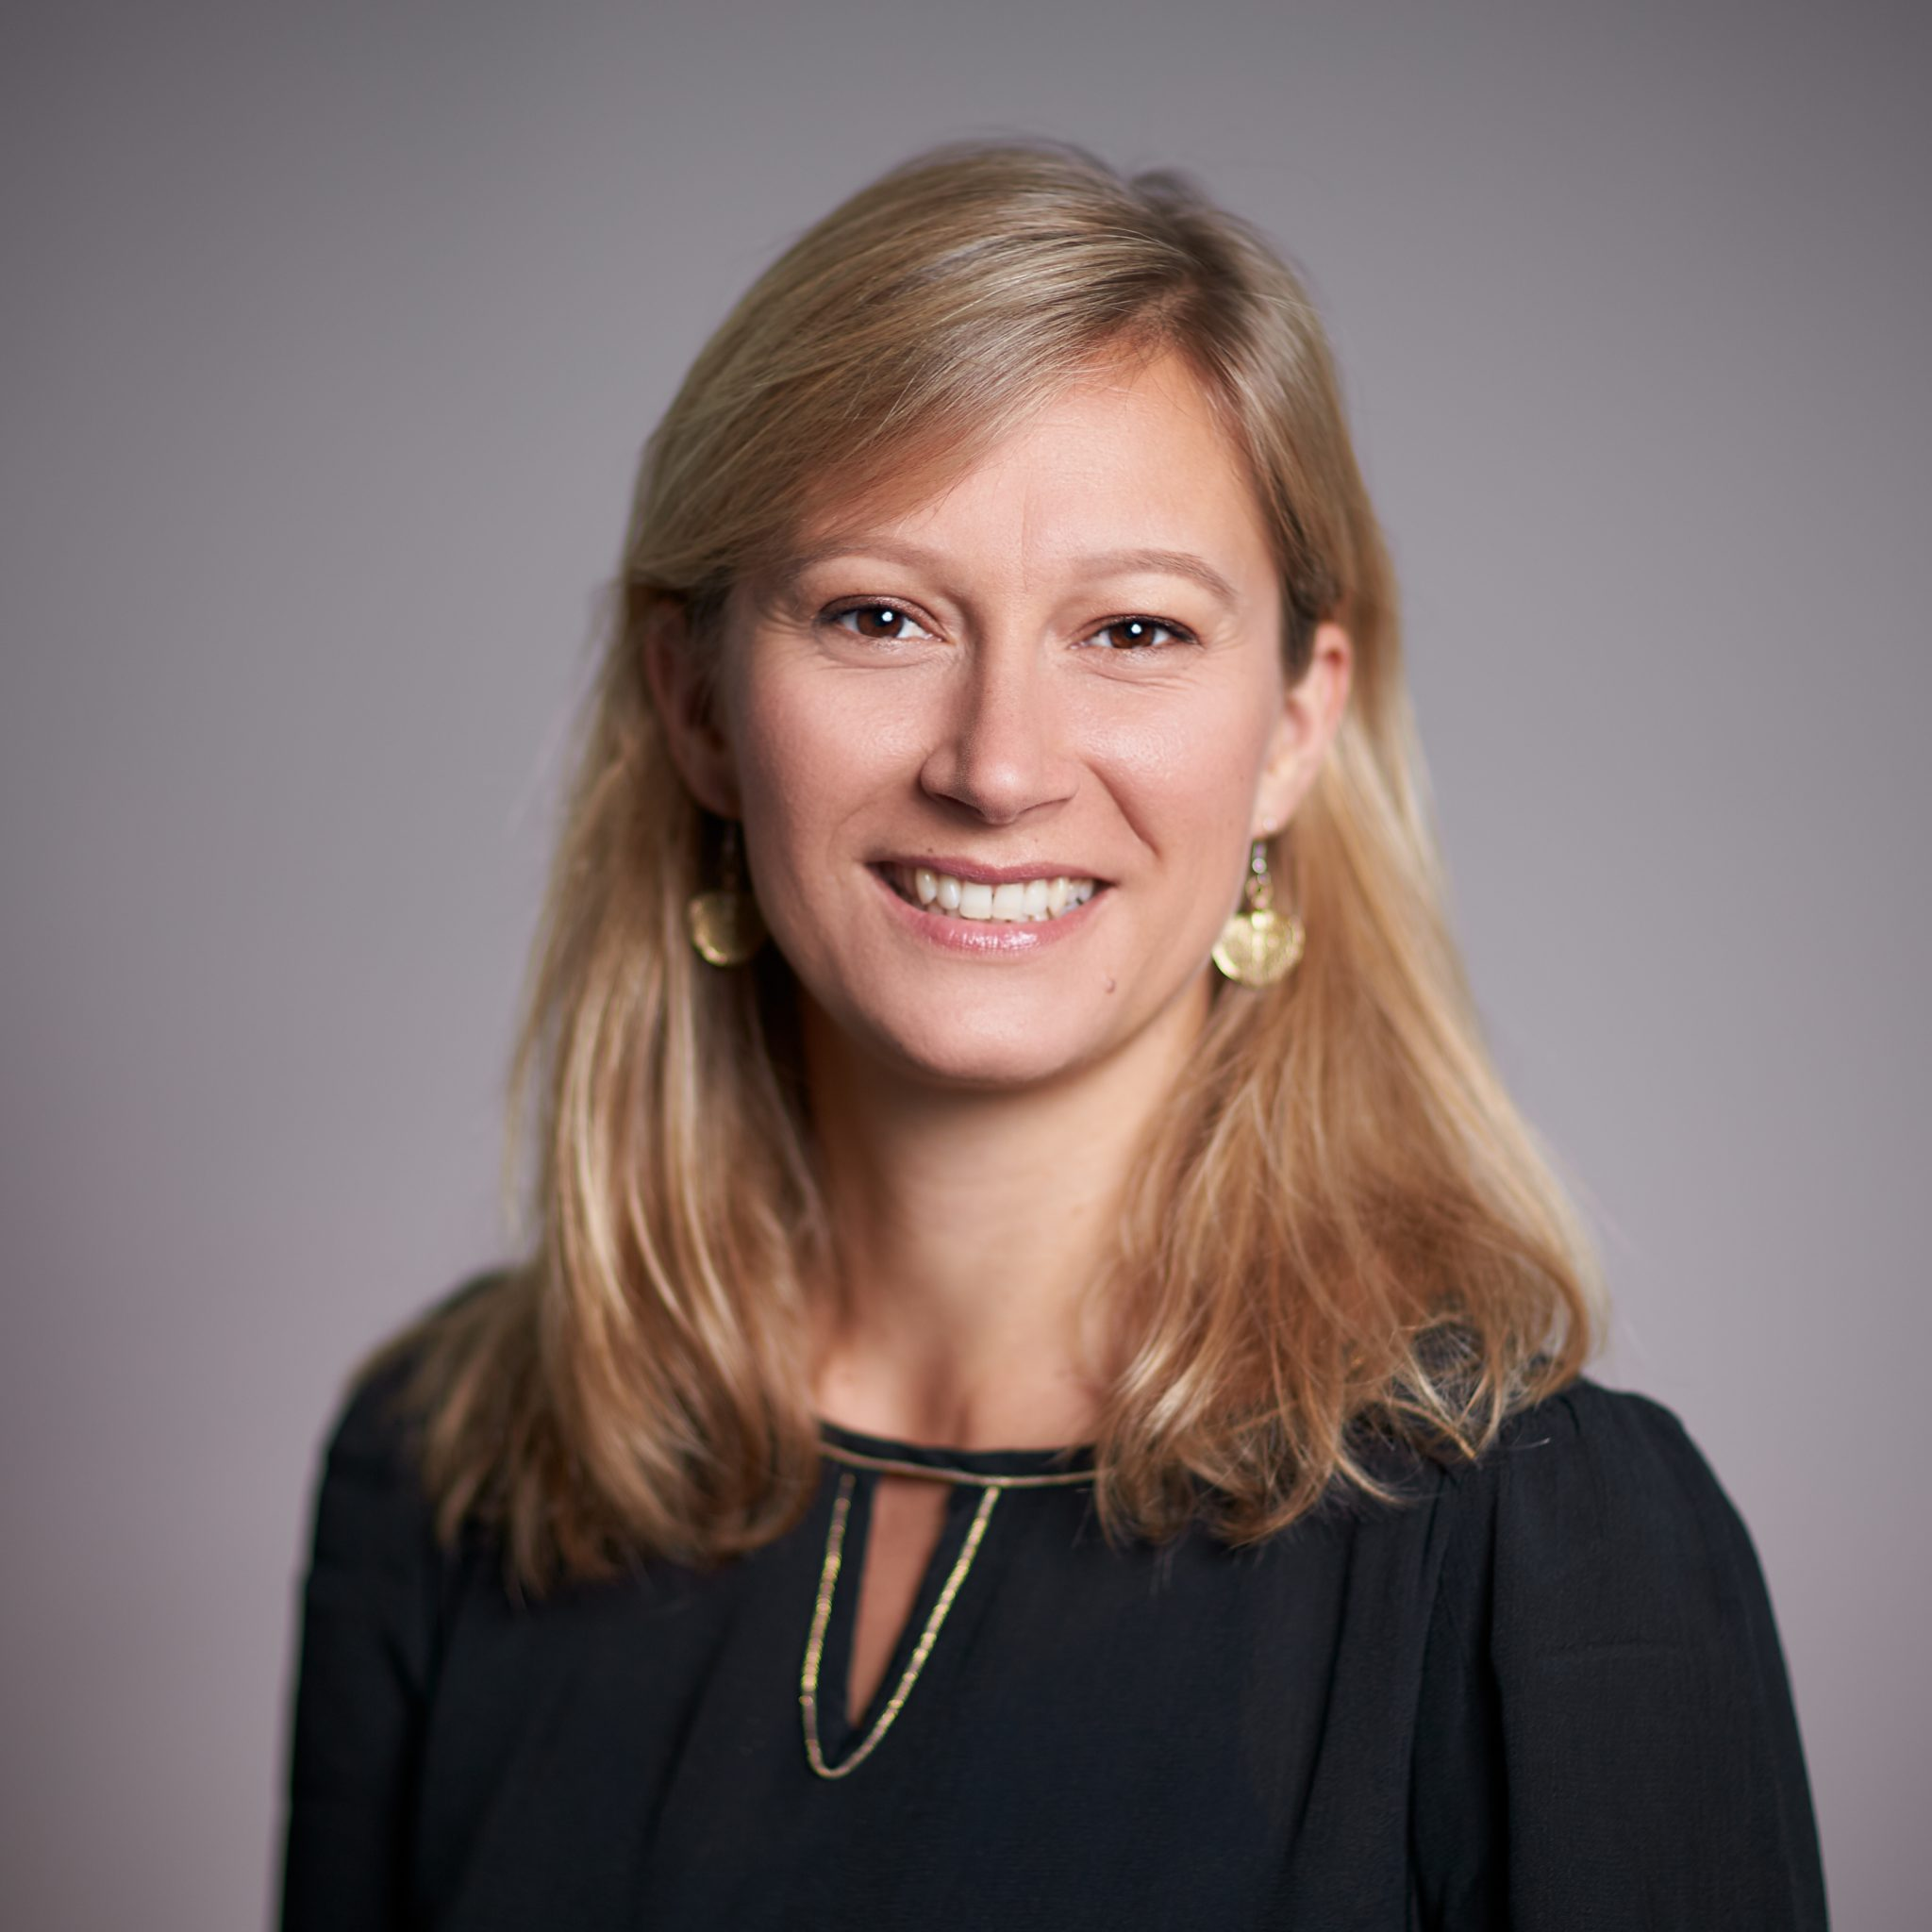 Anne Osdoit, partner at VC Sofinnova Partners focused on health.